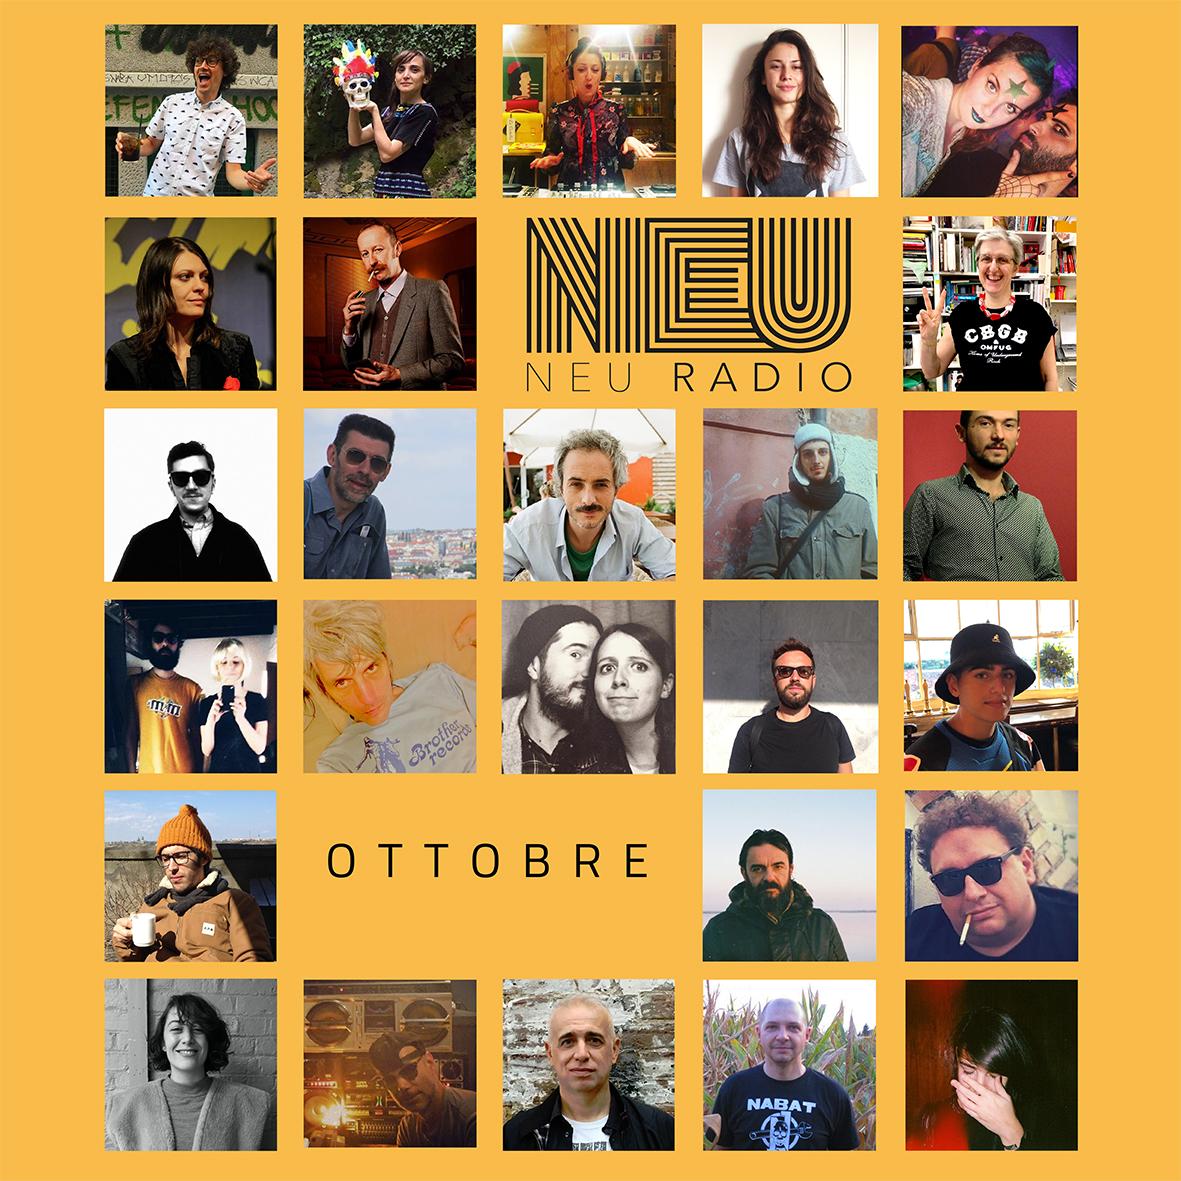 NEU RADIO – Ottobre